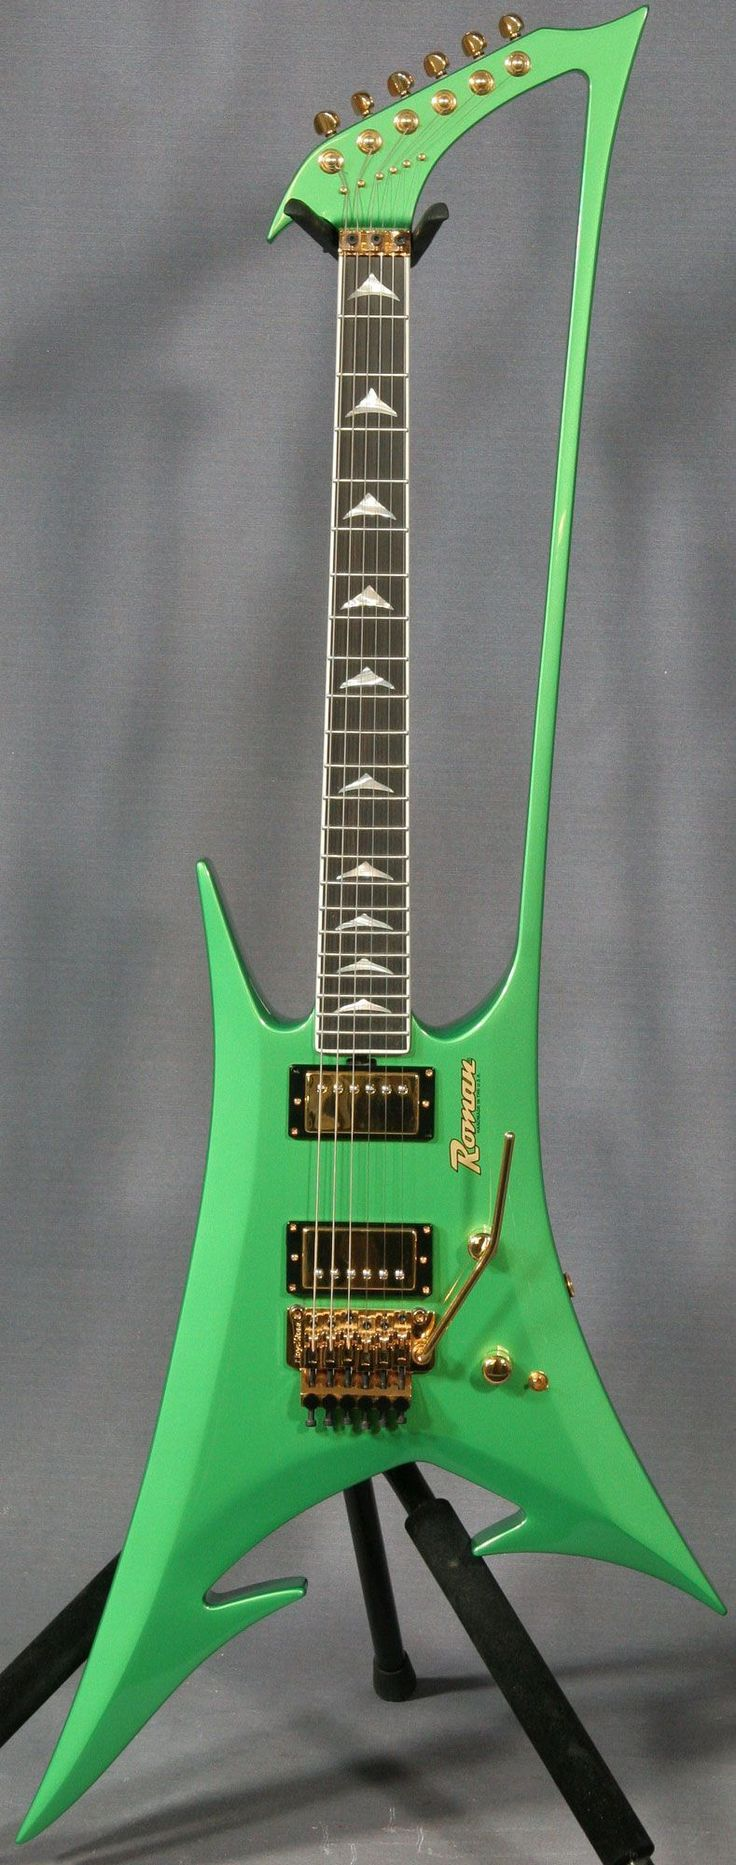 guitars for sale | Abstract Enterprize Guitar - Ed Roman Guitars #acousticguitar